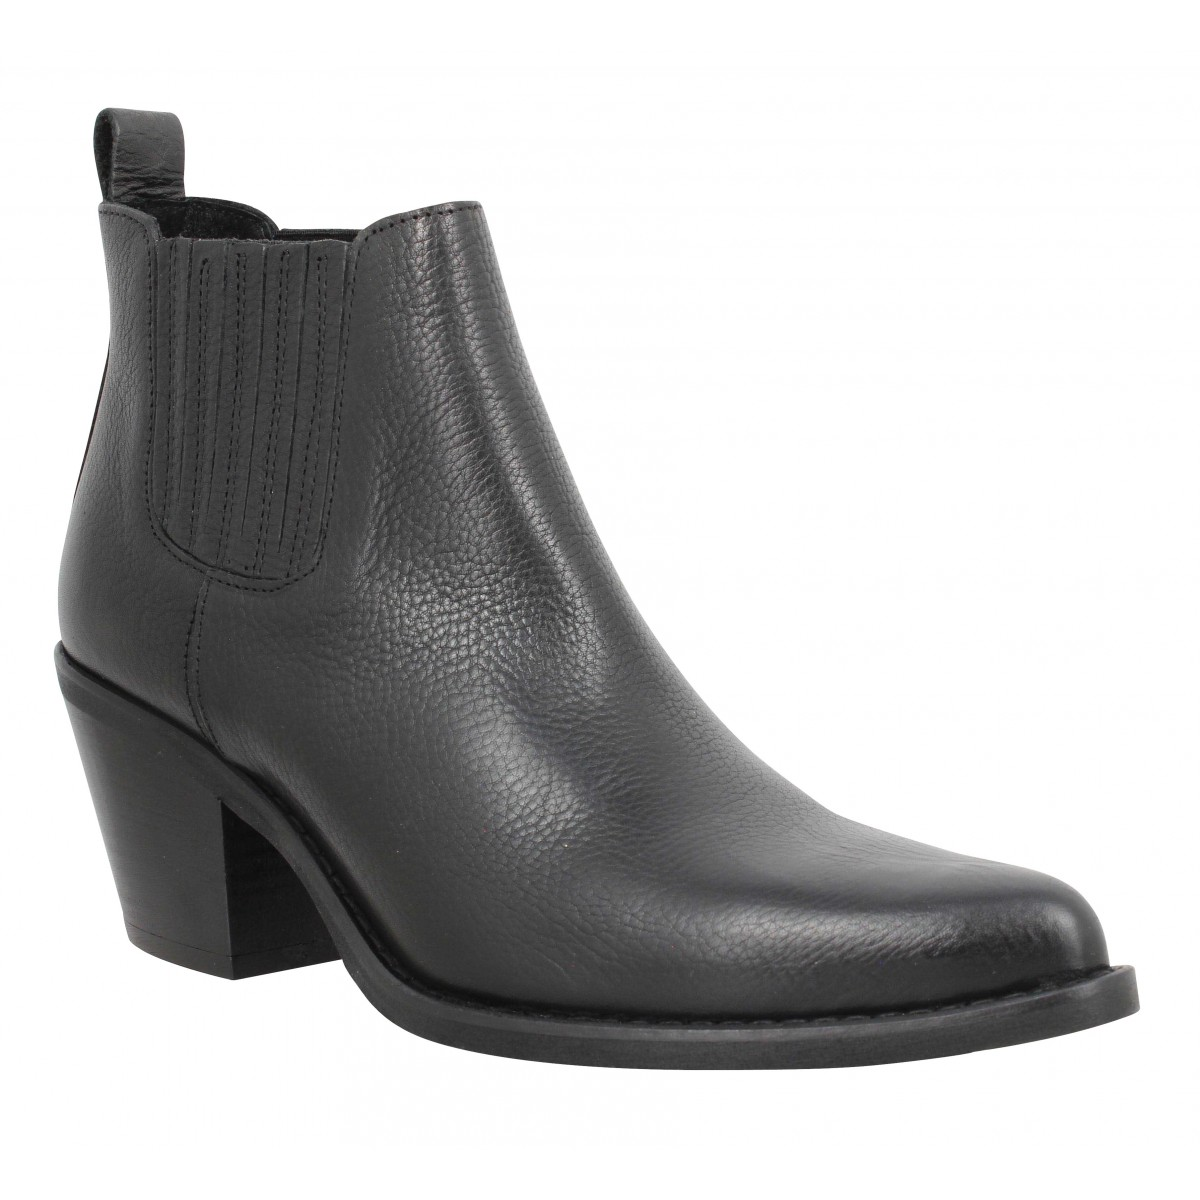 Bottines SEMERDJIAN ER506 cuir Femme Black